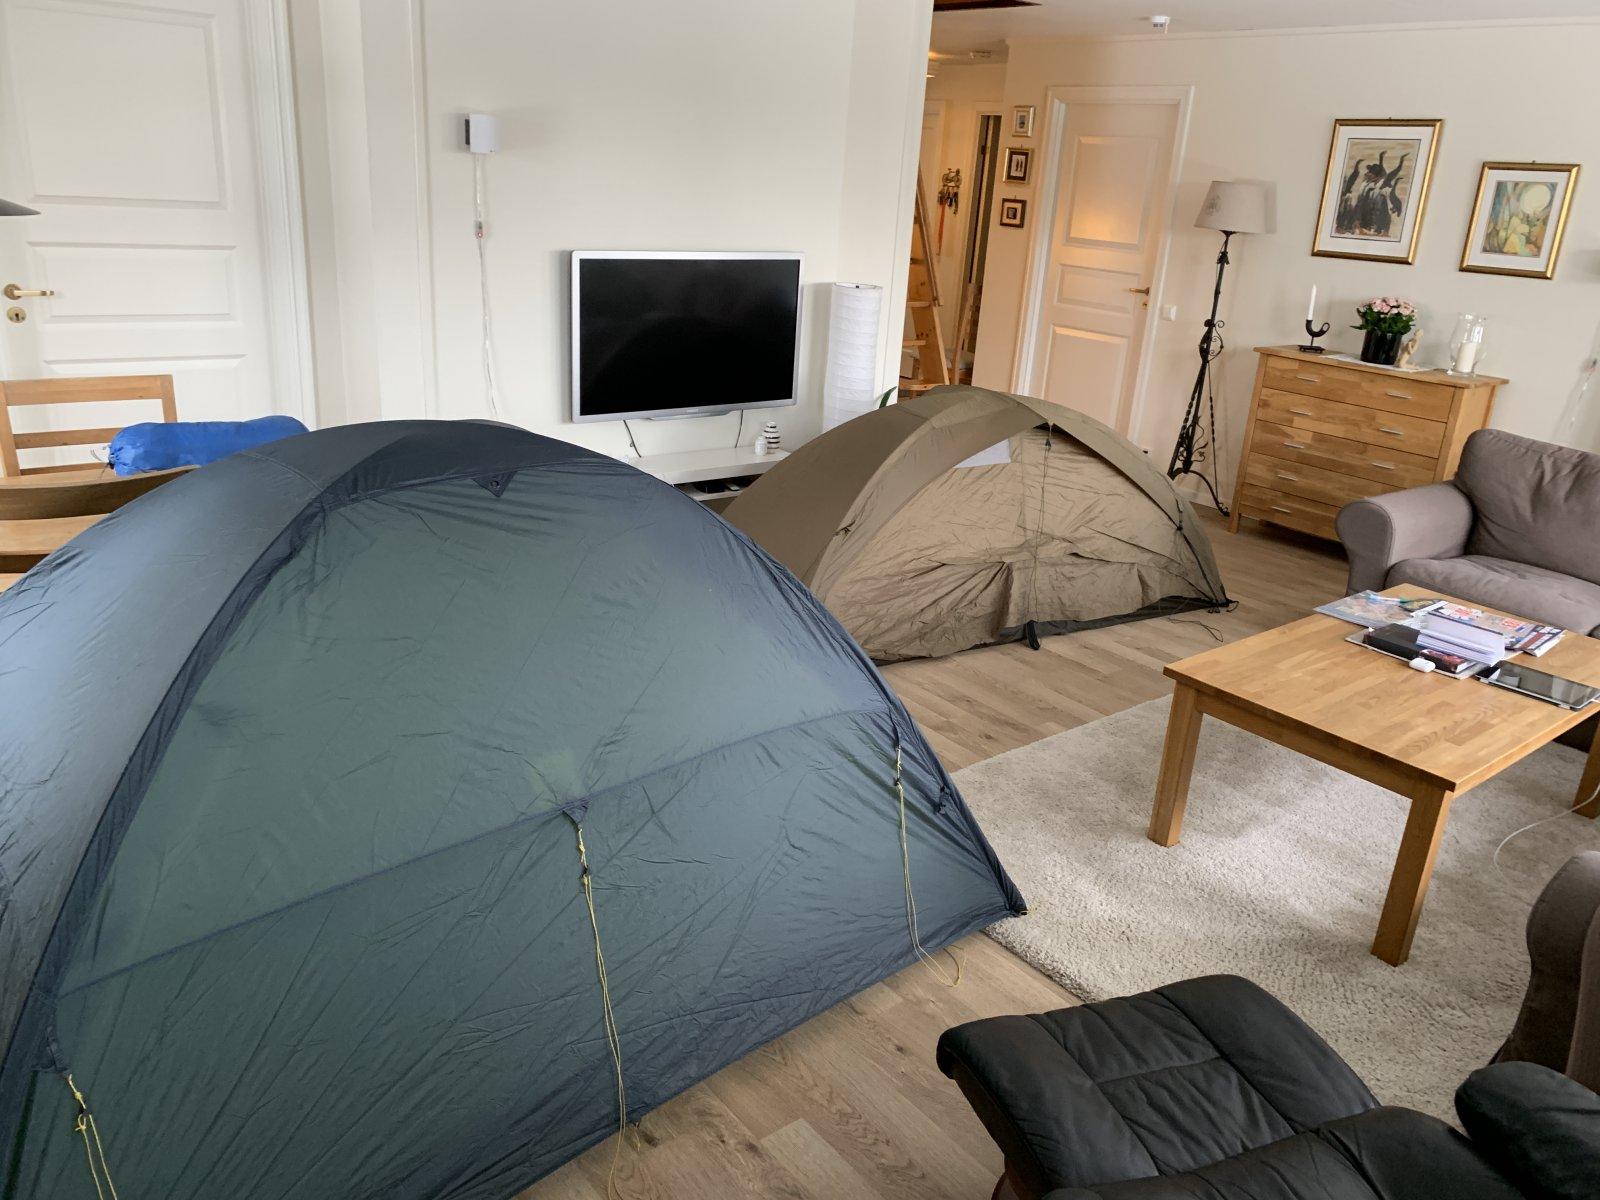 2 telt i stua Trolltind vs Mil 1 LT begge Helsport Telt